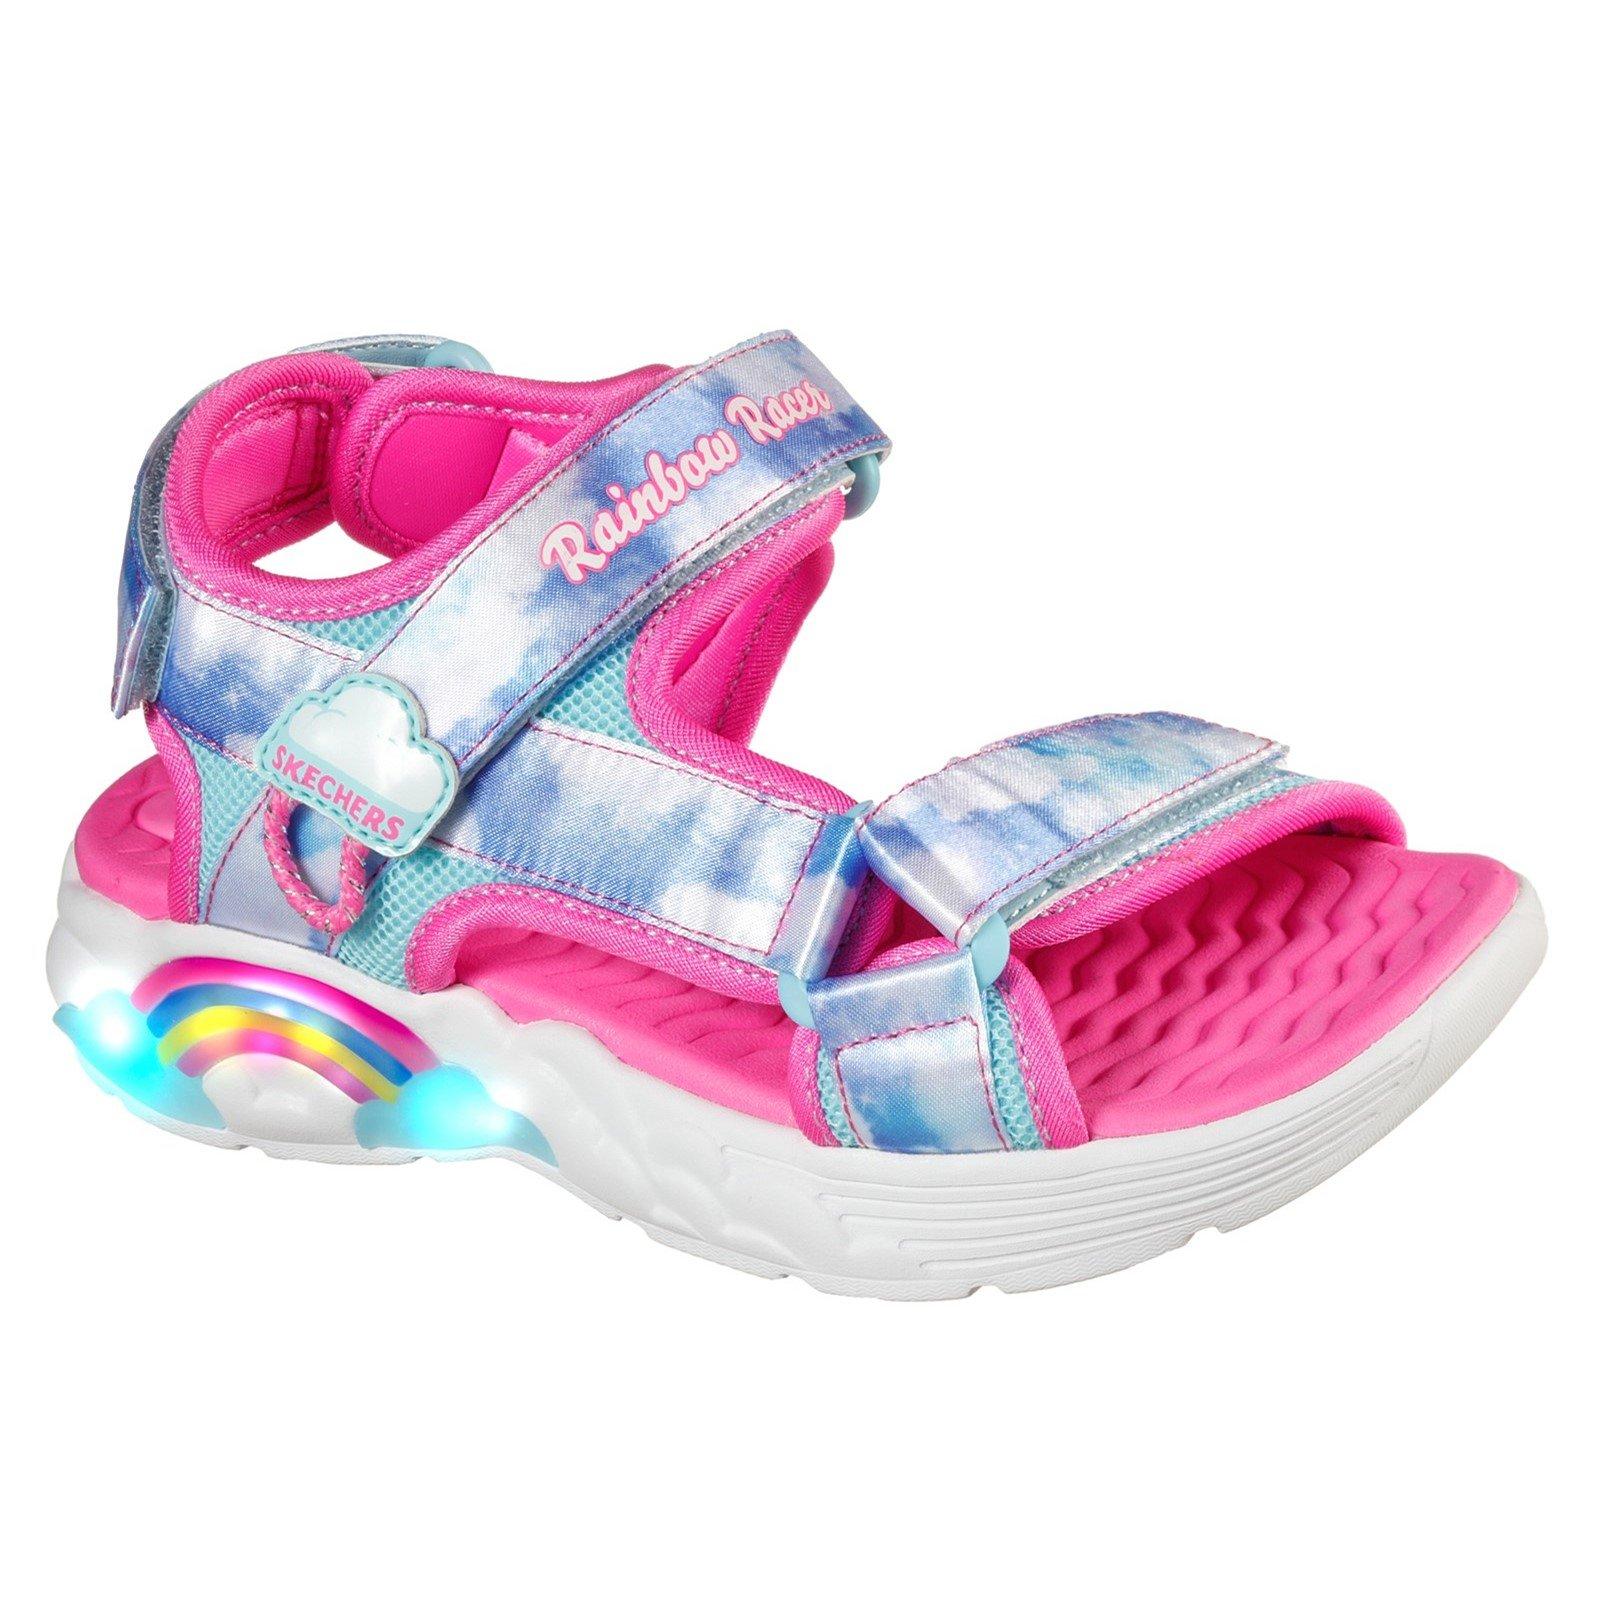 Skechers Unisex Rainbow Racer Summer Sky Beach Sandals Multicolor 32096 - Pink/Blue Textile 11.5